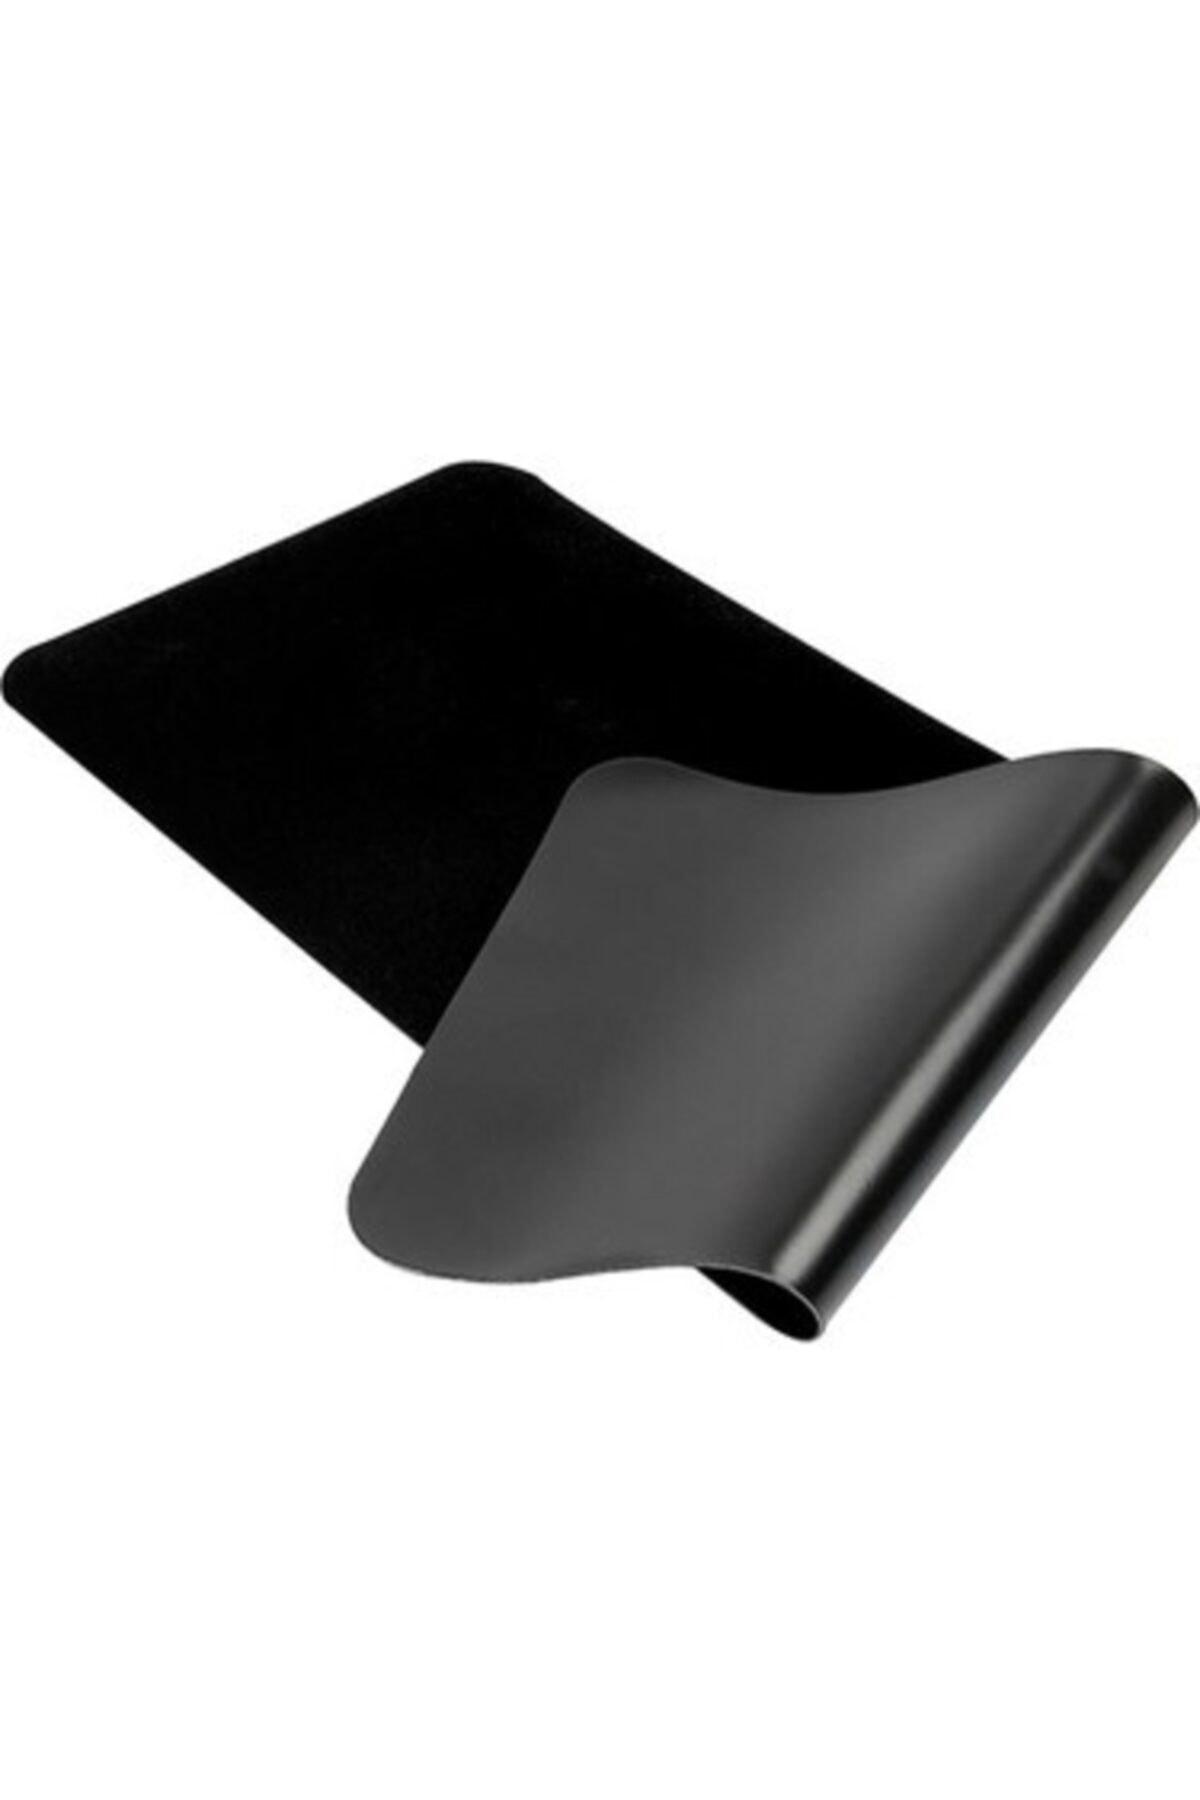 ADDISON Oyuncu Uzun  Mouse Pad 300271 2